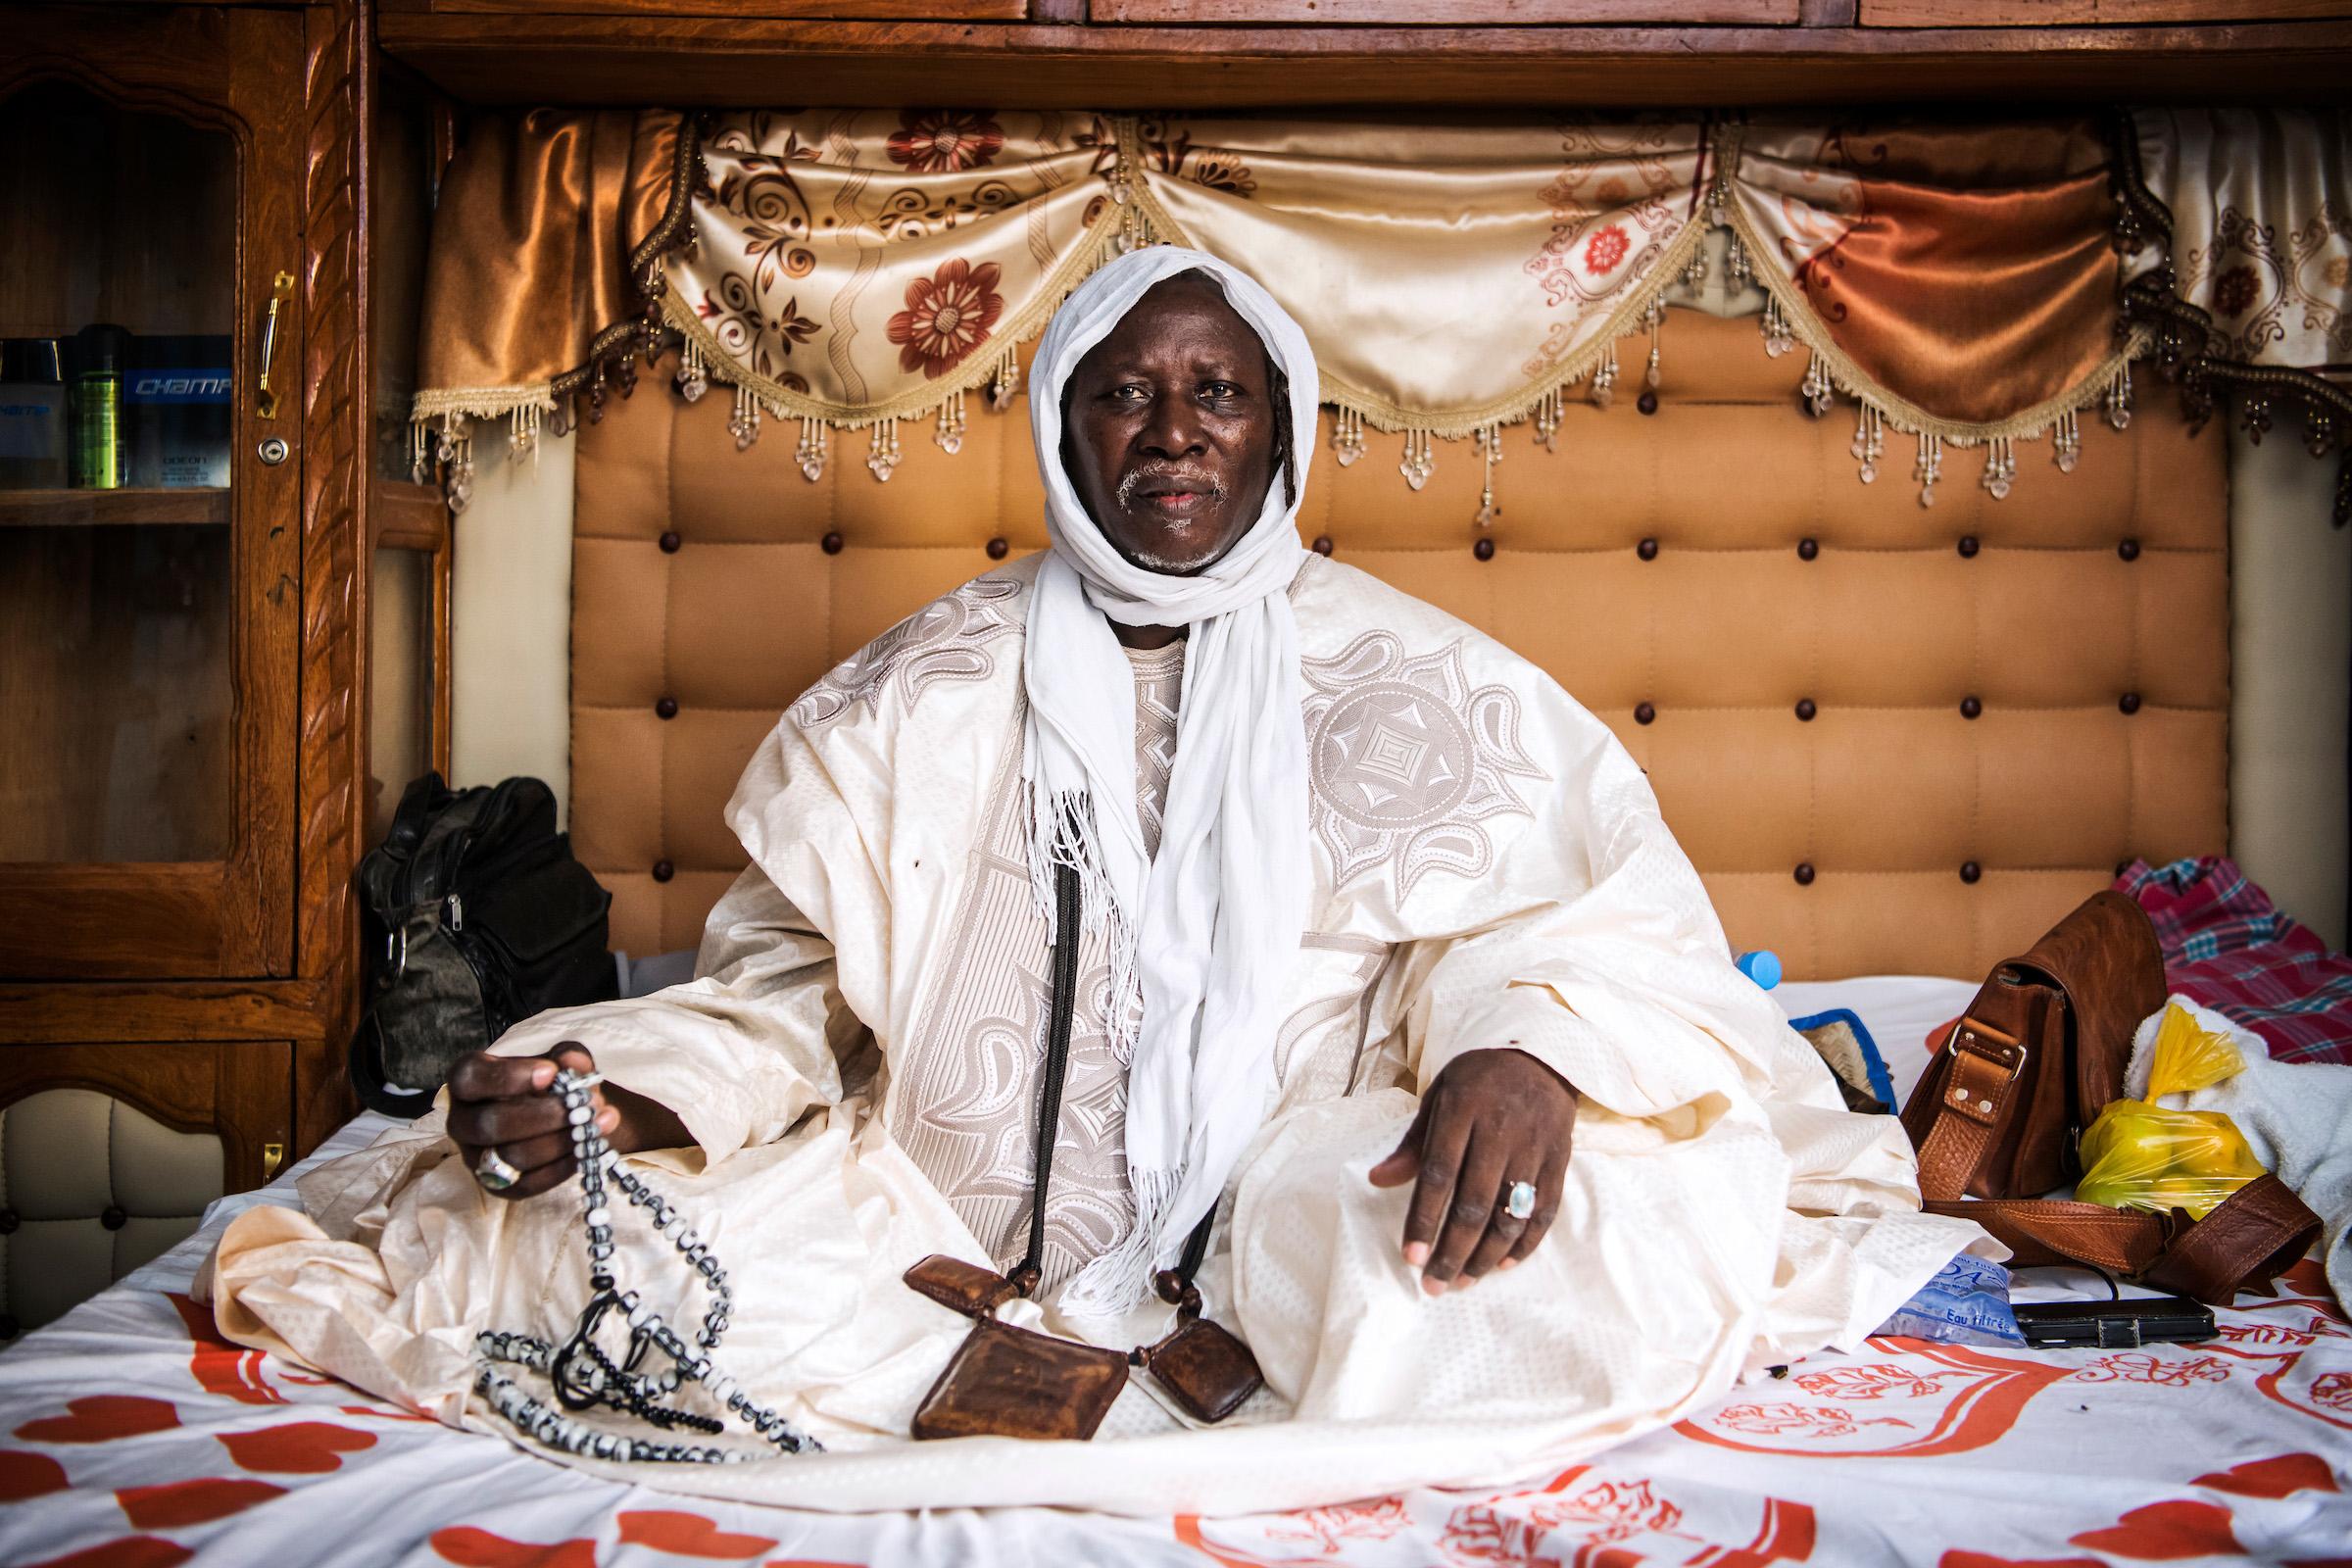 013_Sufis_Senegal.jpg